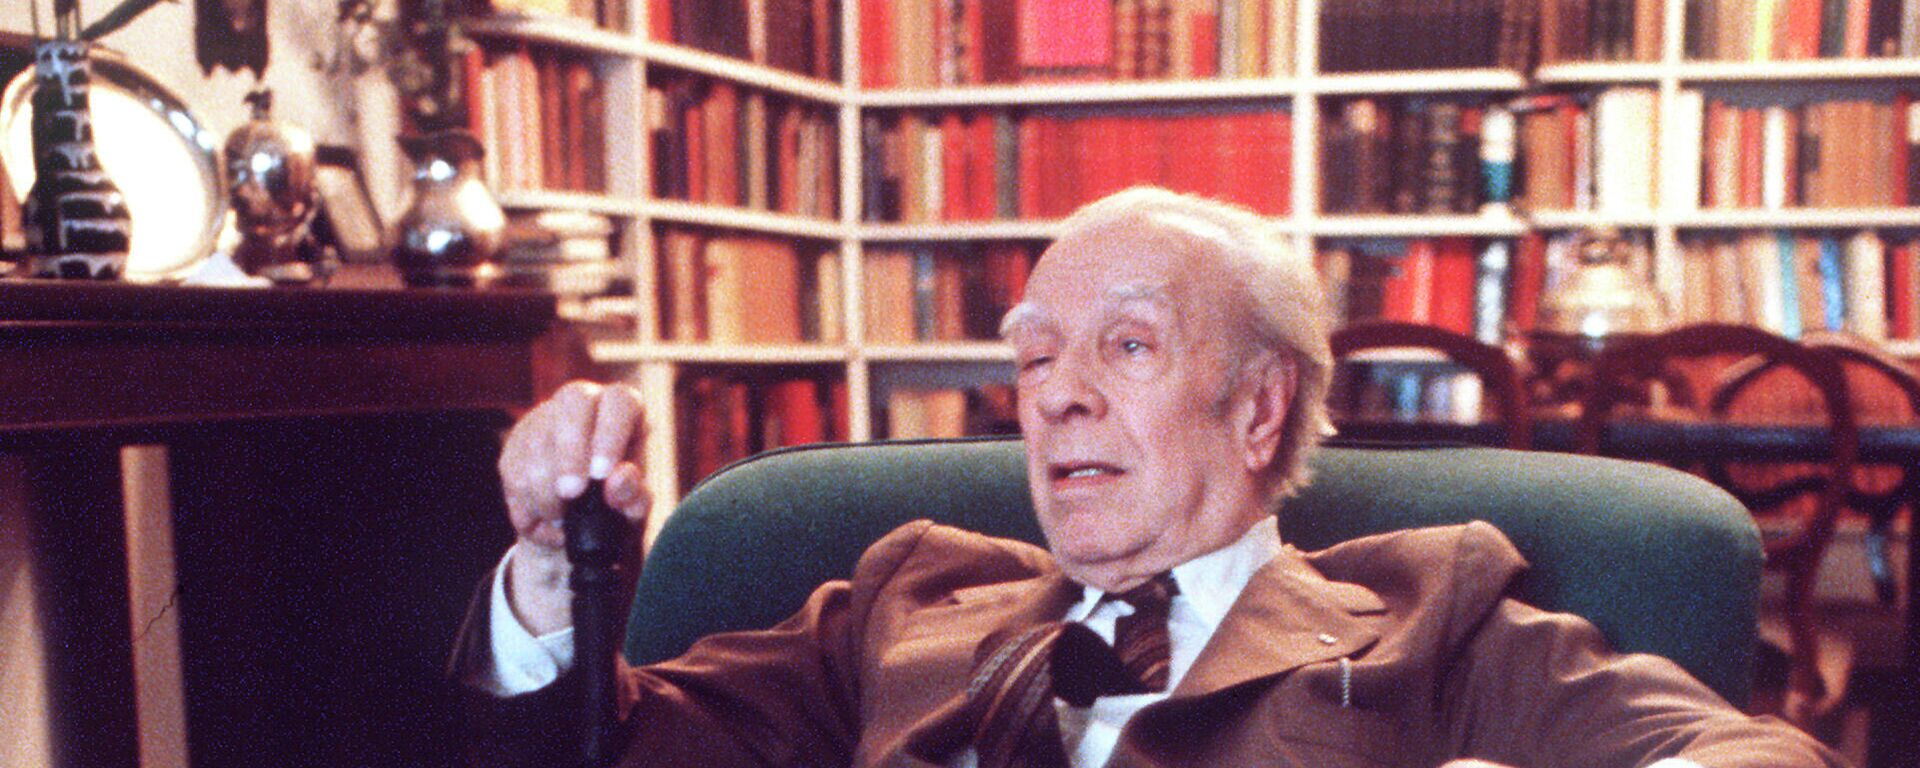 El escritor argentino Jorge Luis Borges (1899-1986) - Sputnik Mundo, 1920, 01.10.2021